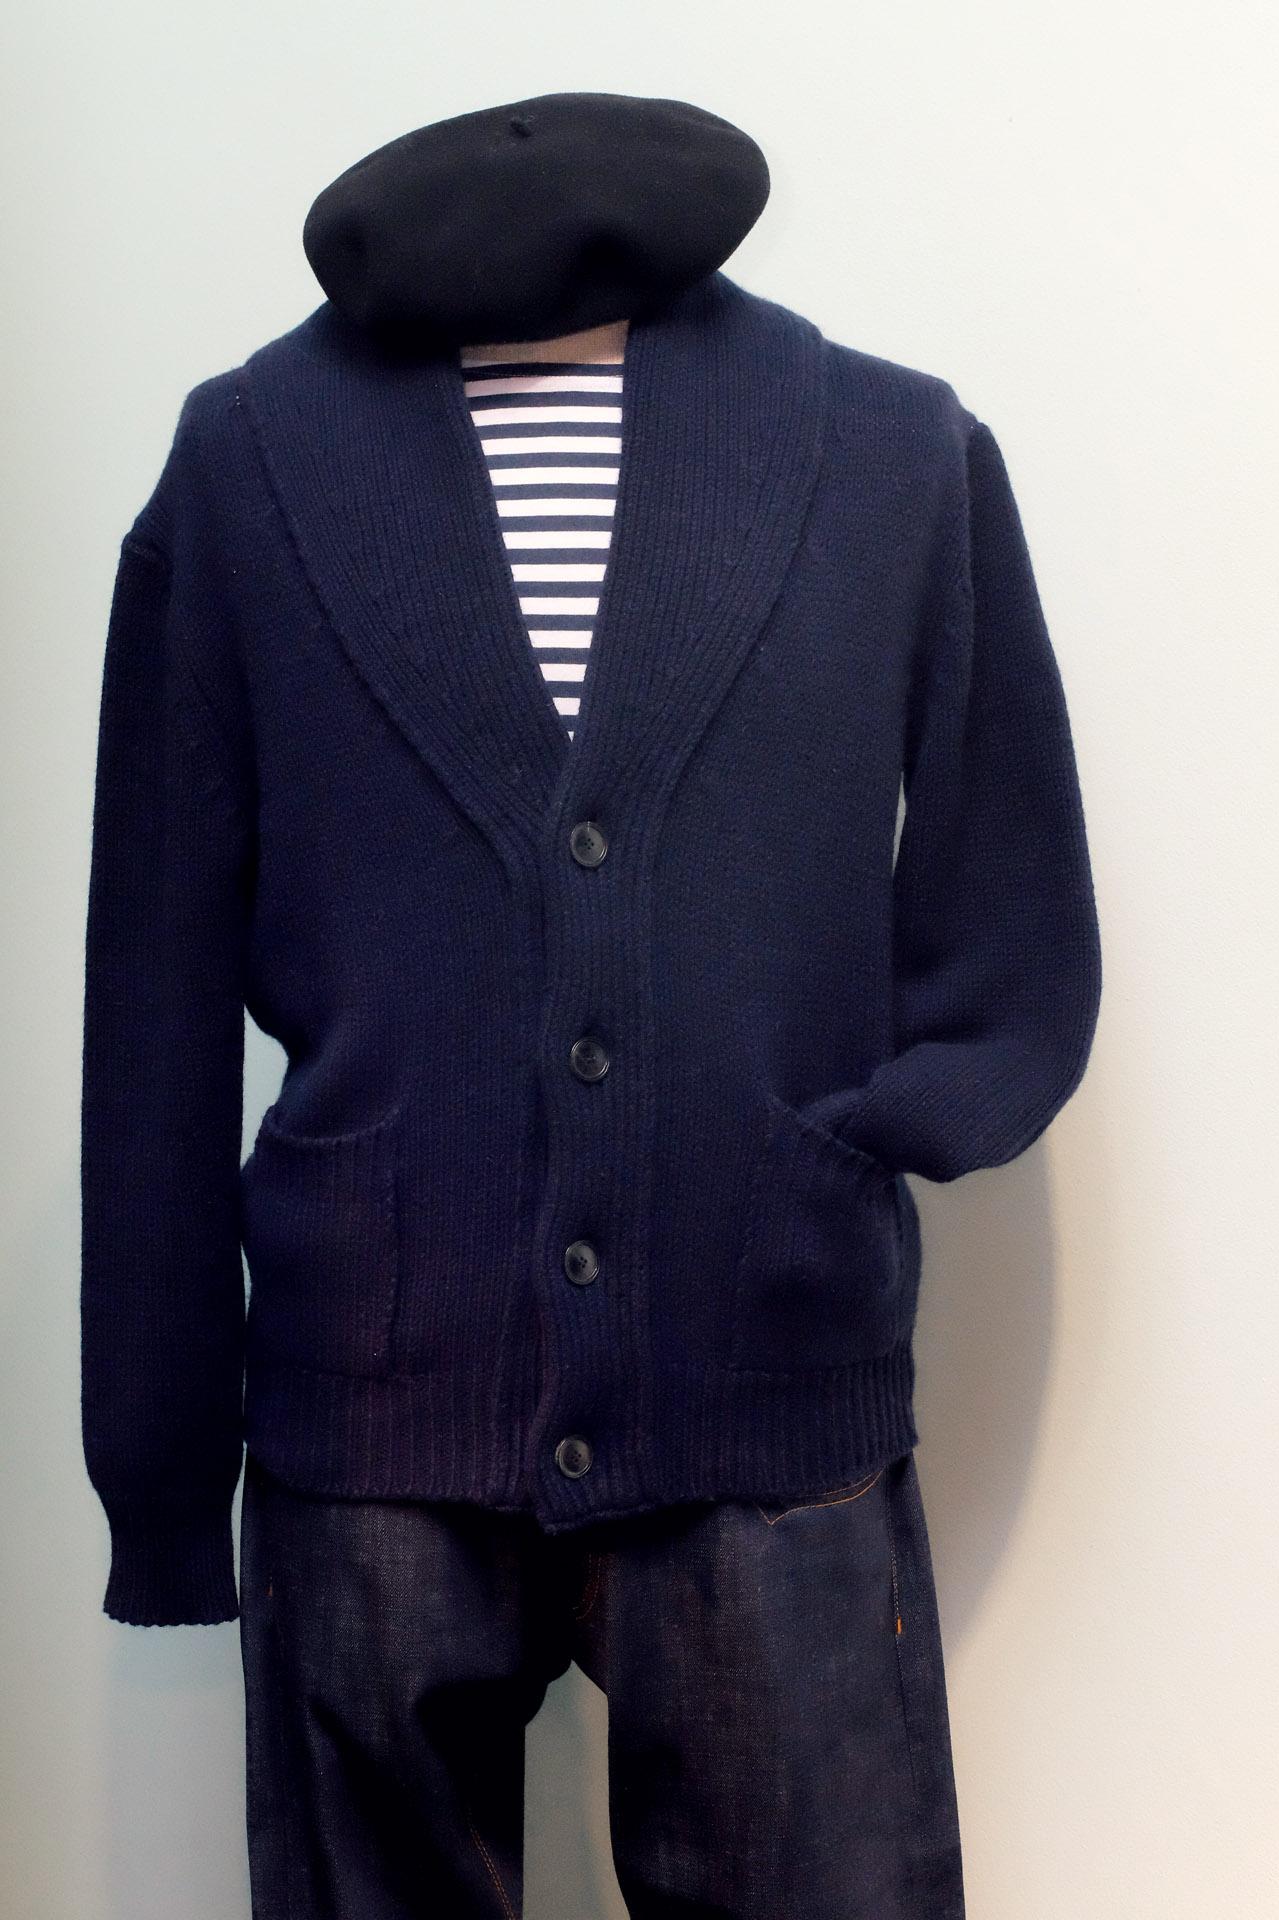 aragona-strickjacke-wolle-strick-blau-marine-streifenshirt-barett-jeans